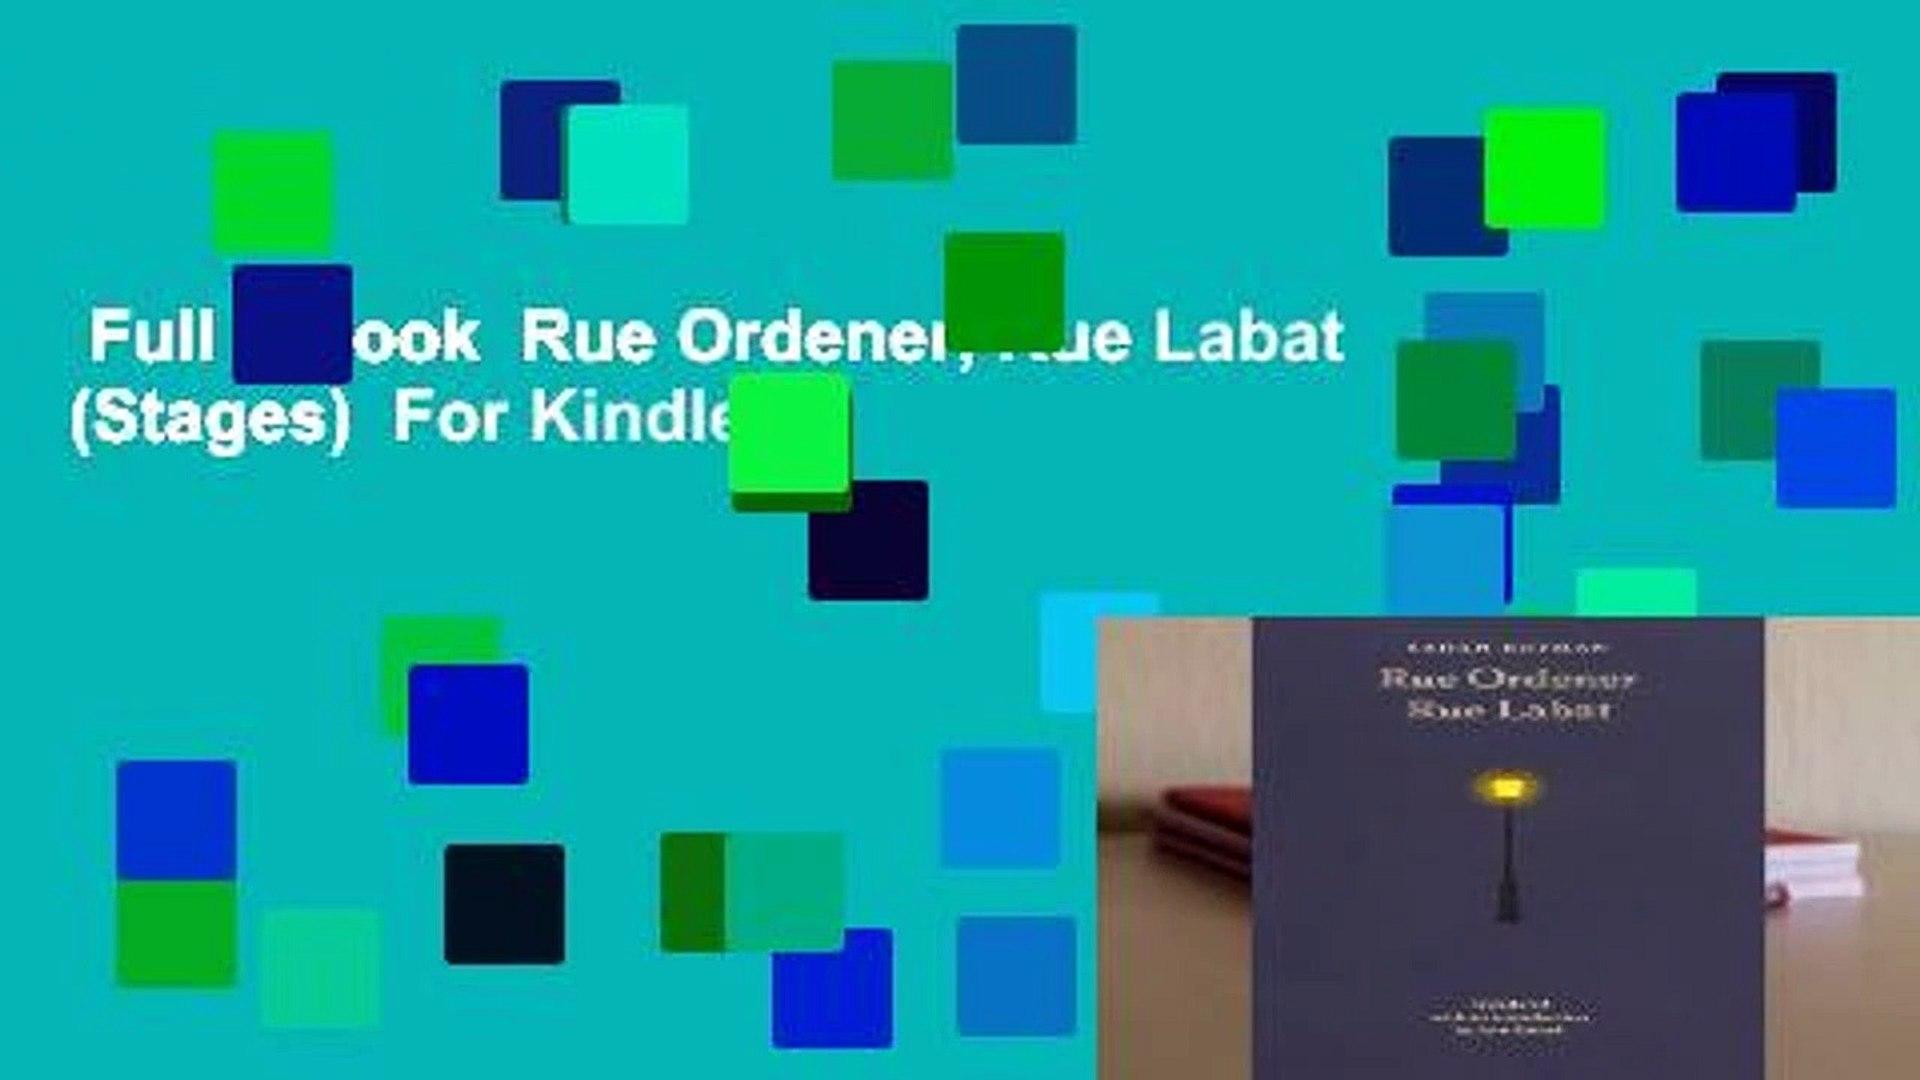 Full E Book Rue Ordener Rue Labat Stages For Kindle